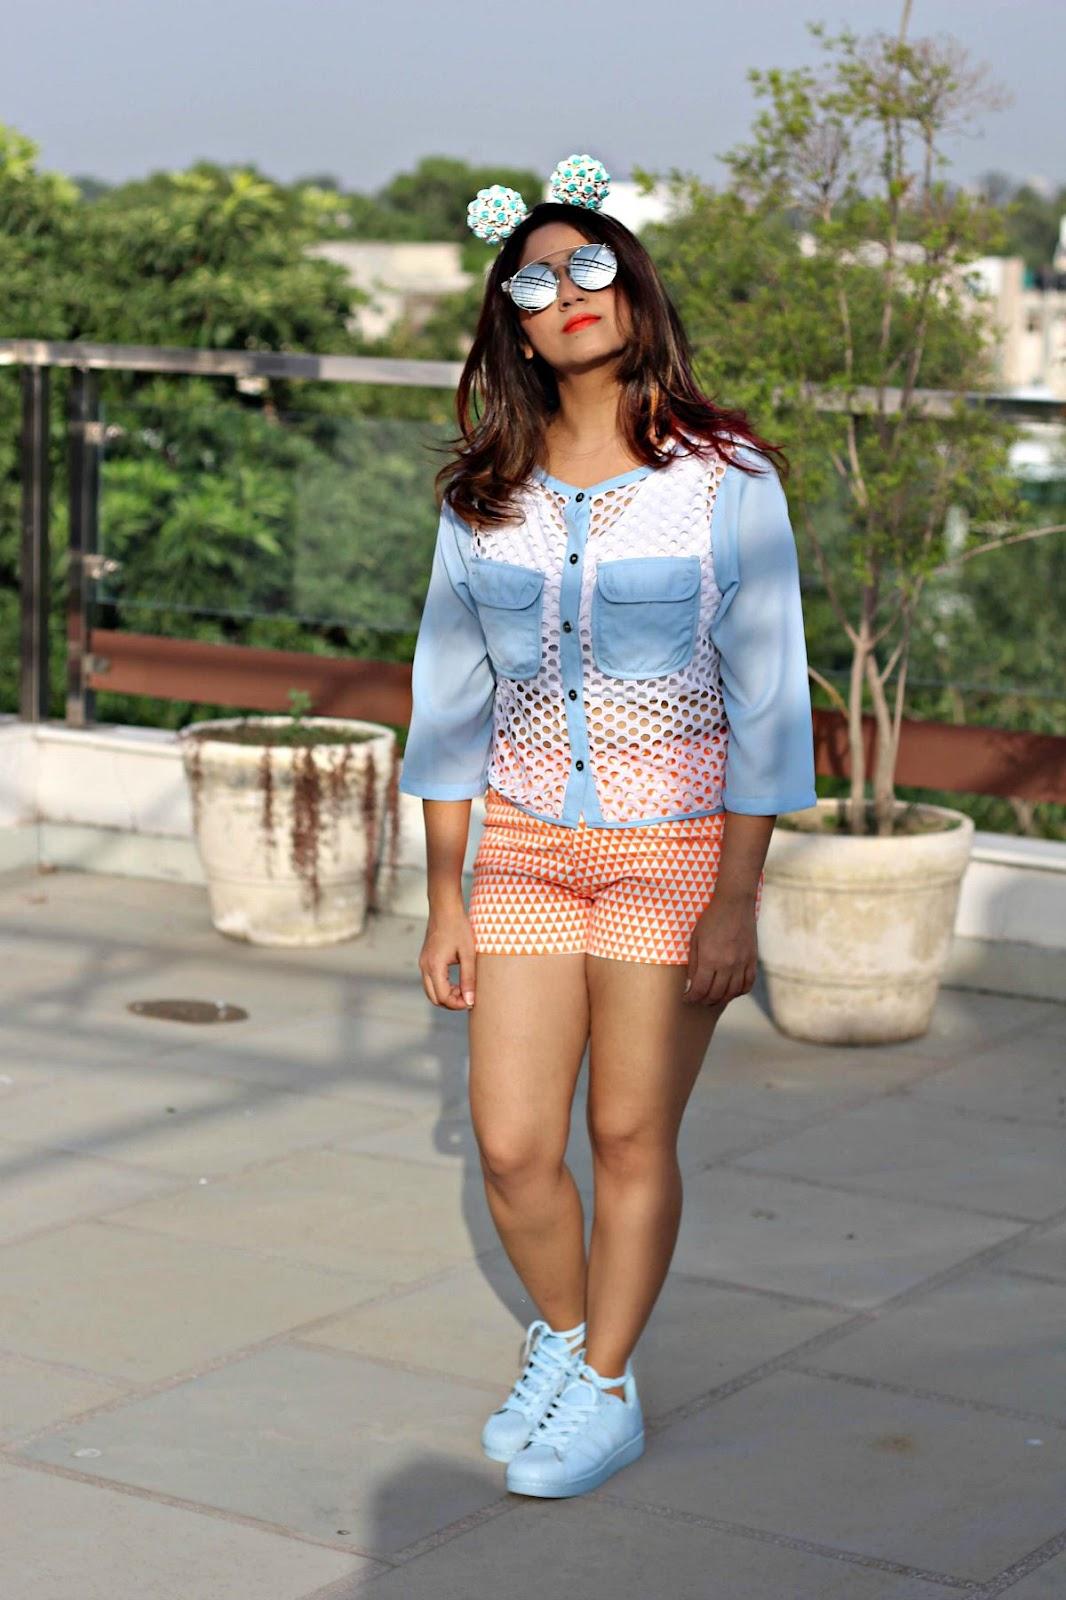 milan fashion week street style, streetstyle , cosmopolitan